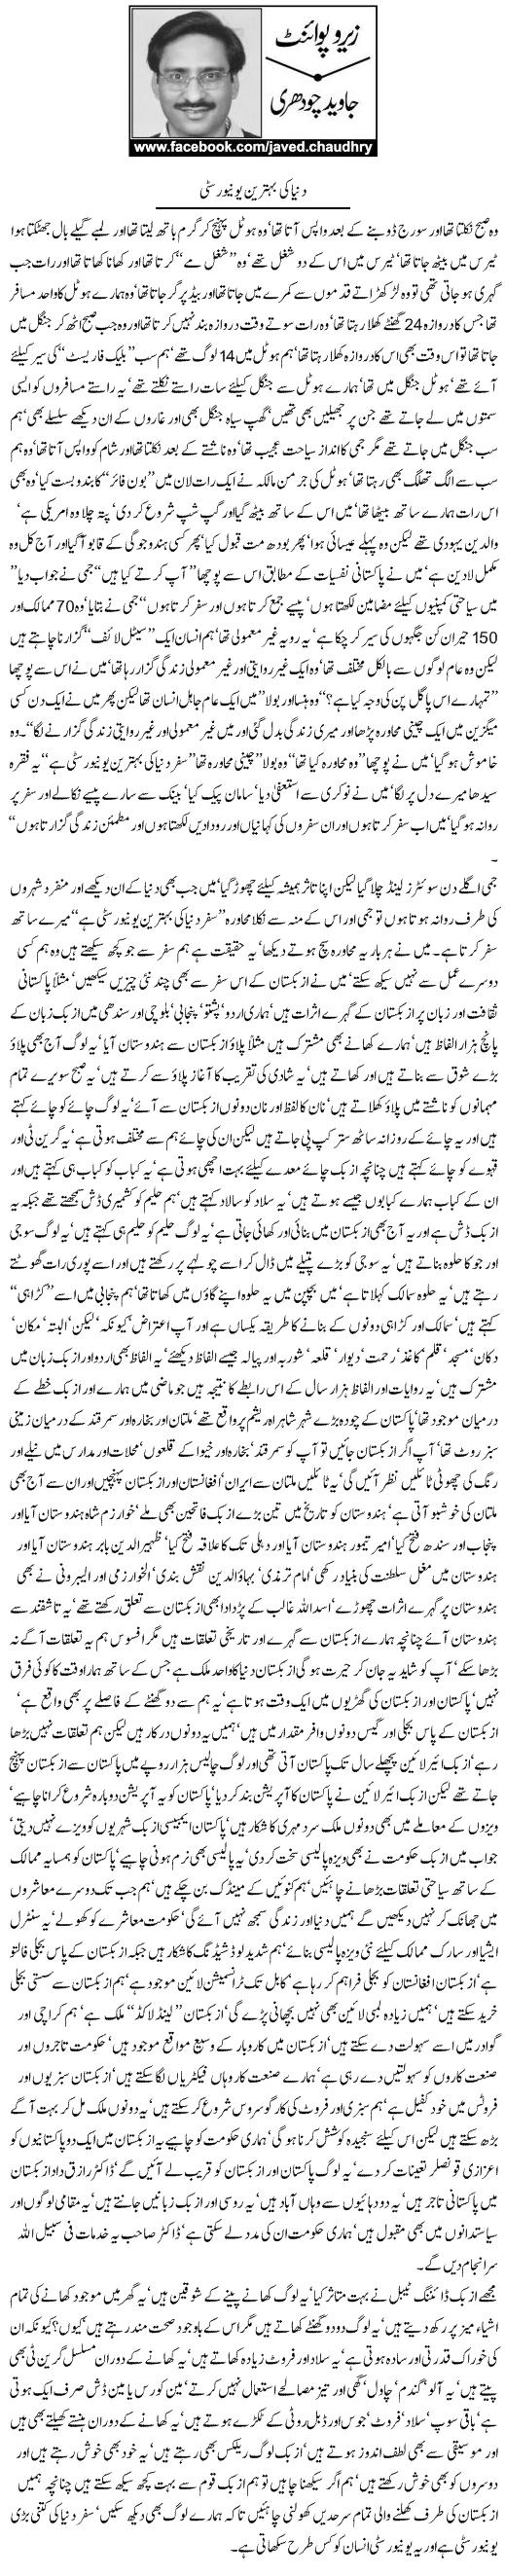 Dunya Ki Behtrien University By Javed Chaudhry - Zero Point - Pakfunny